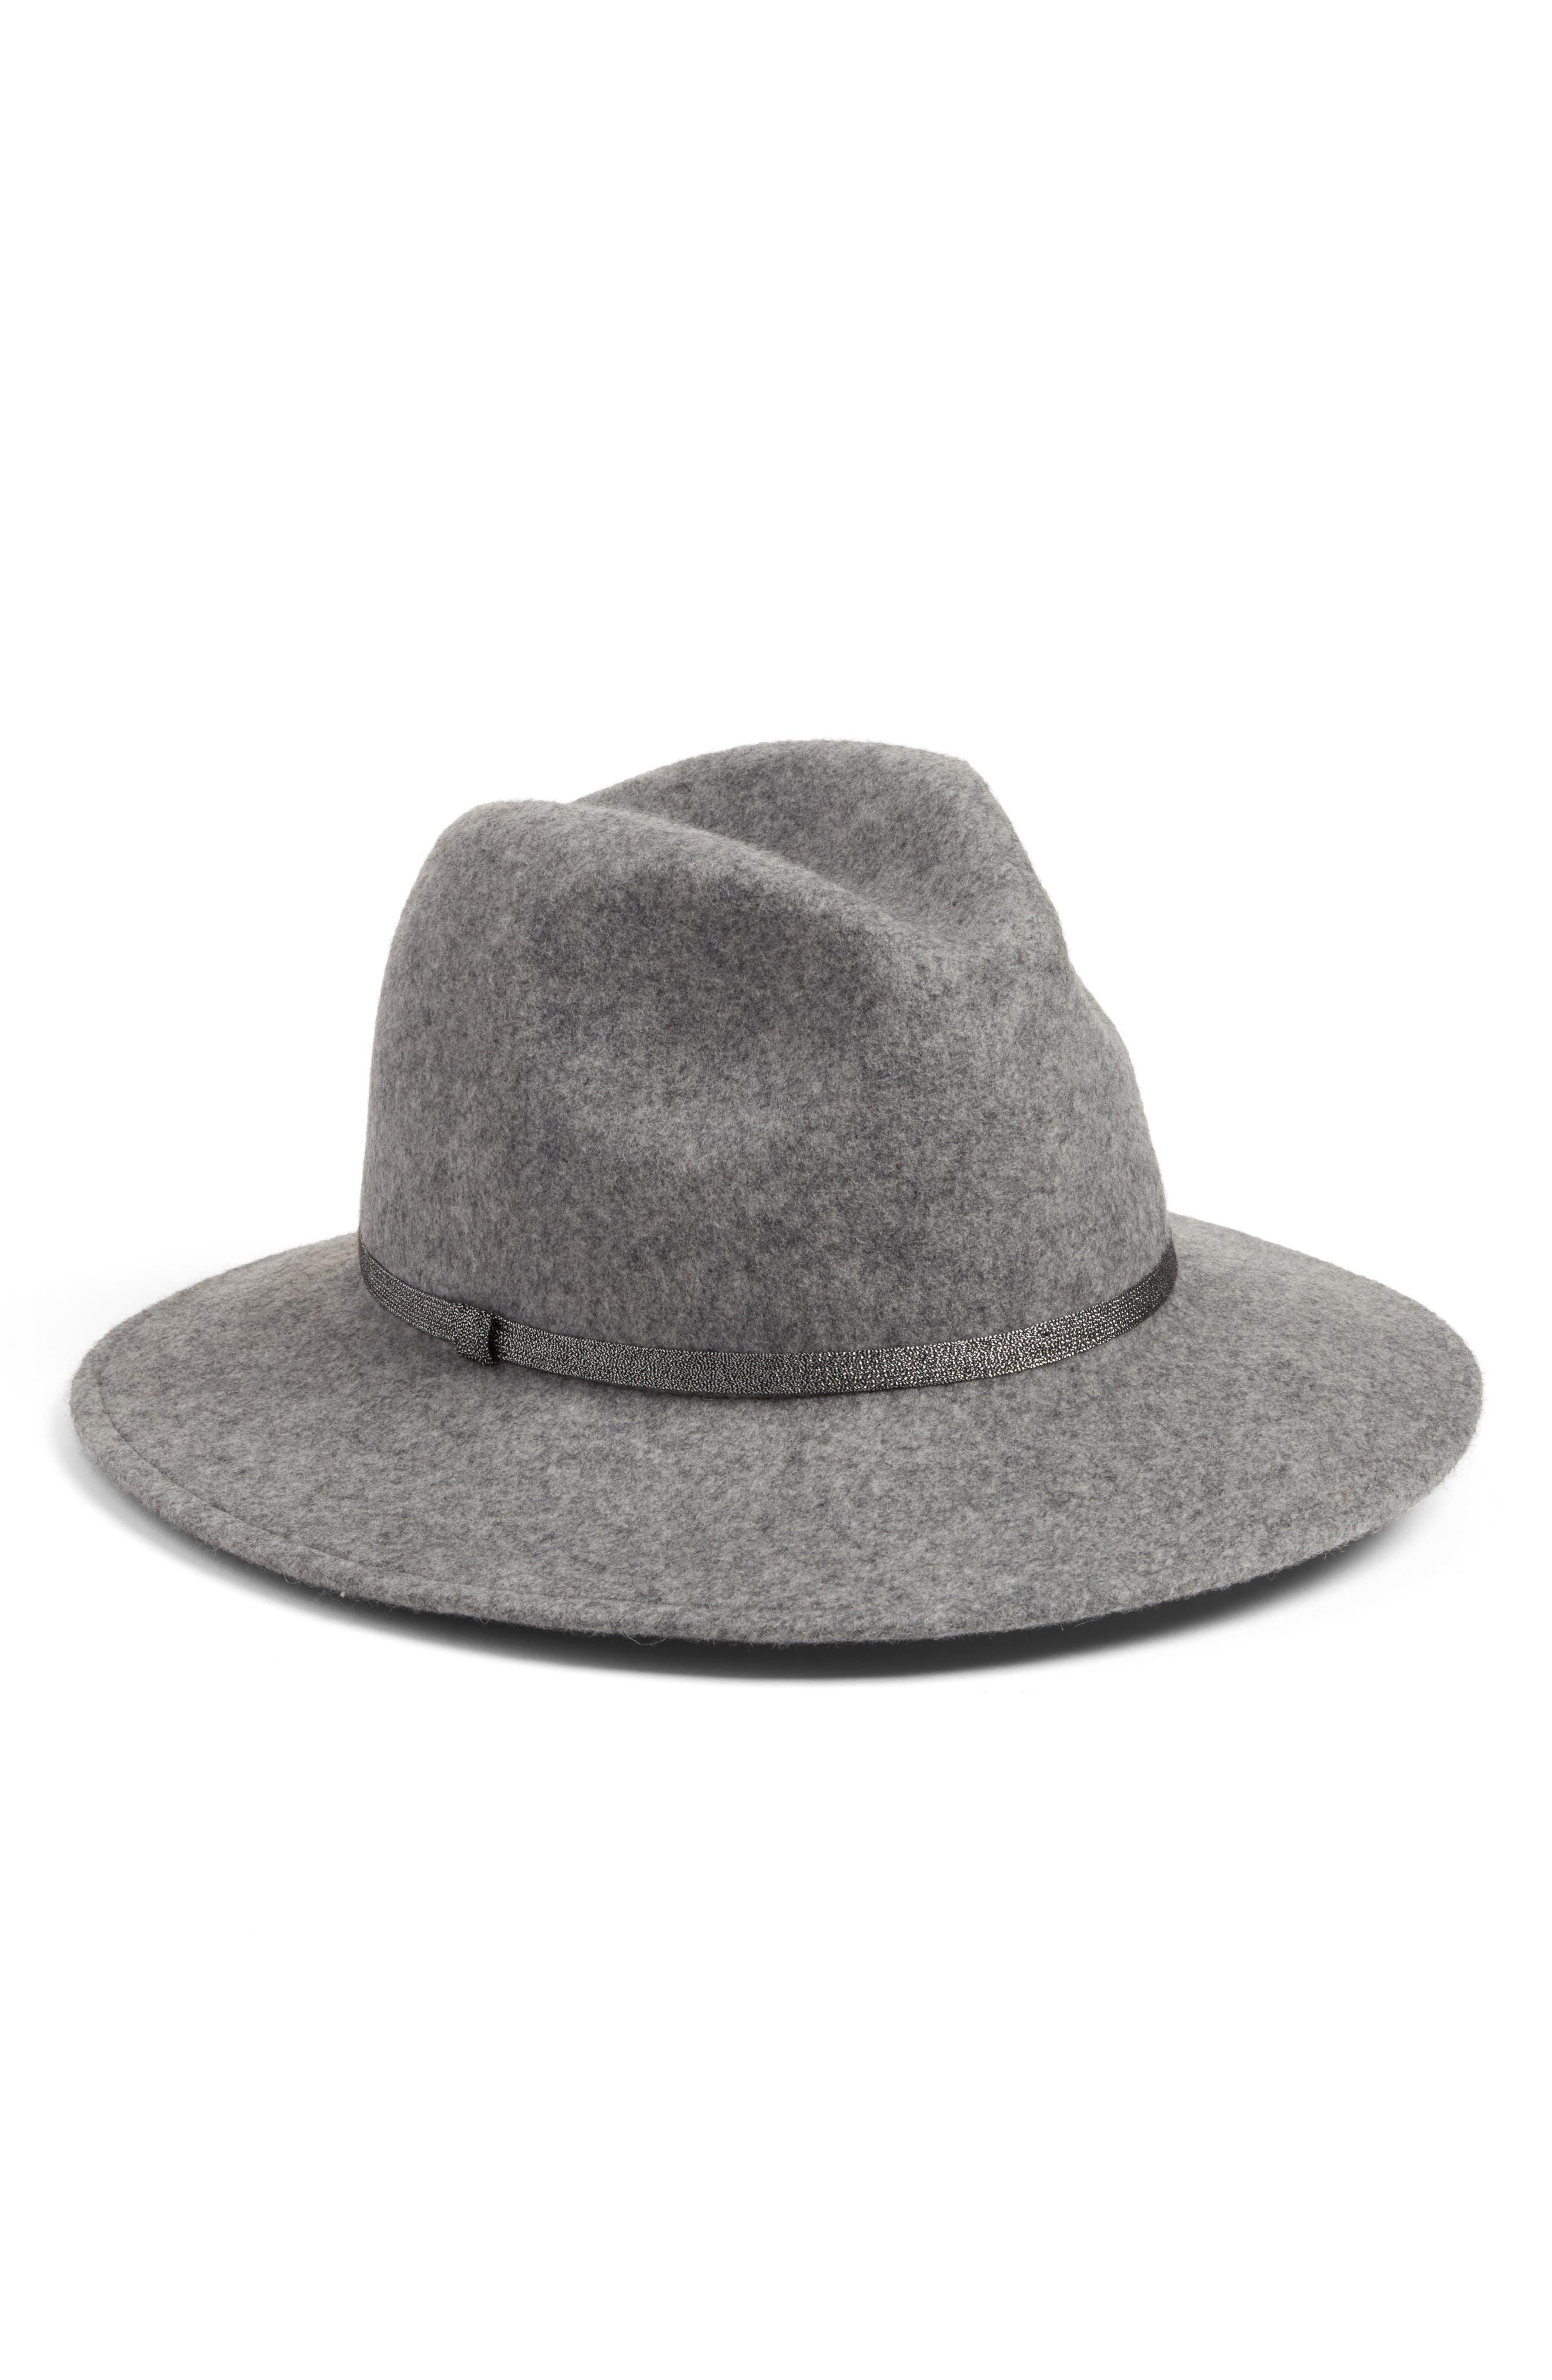 Main Image - Treasure & Bond Metallic Band Wool Felt Panama Hat